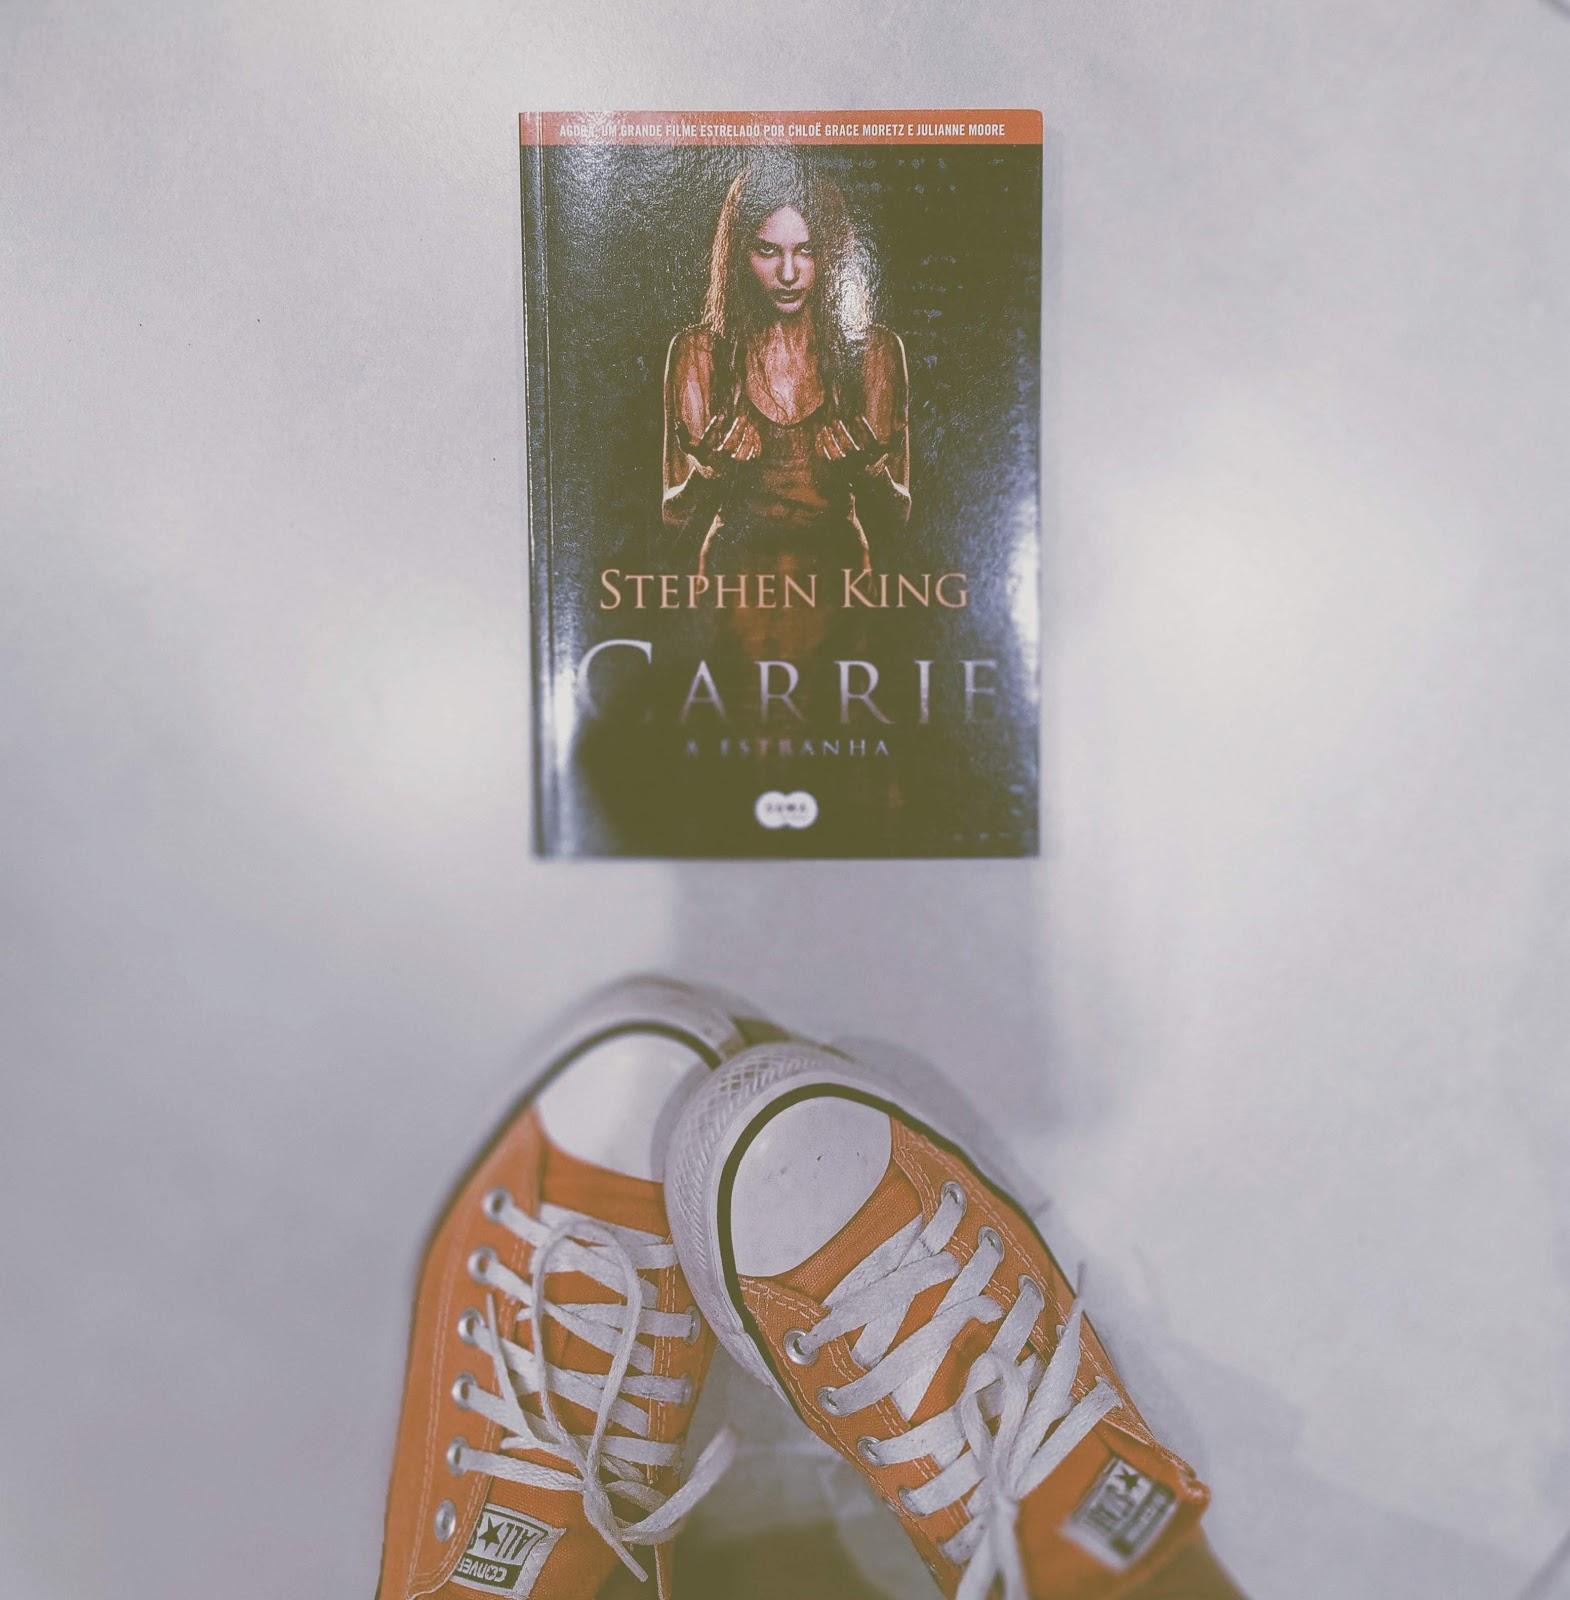 Stephen King livros